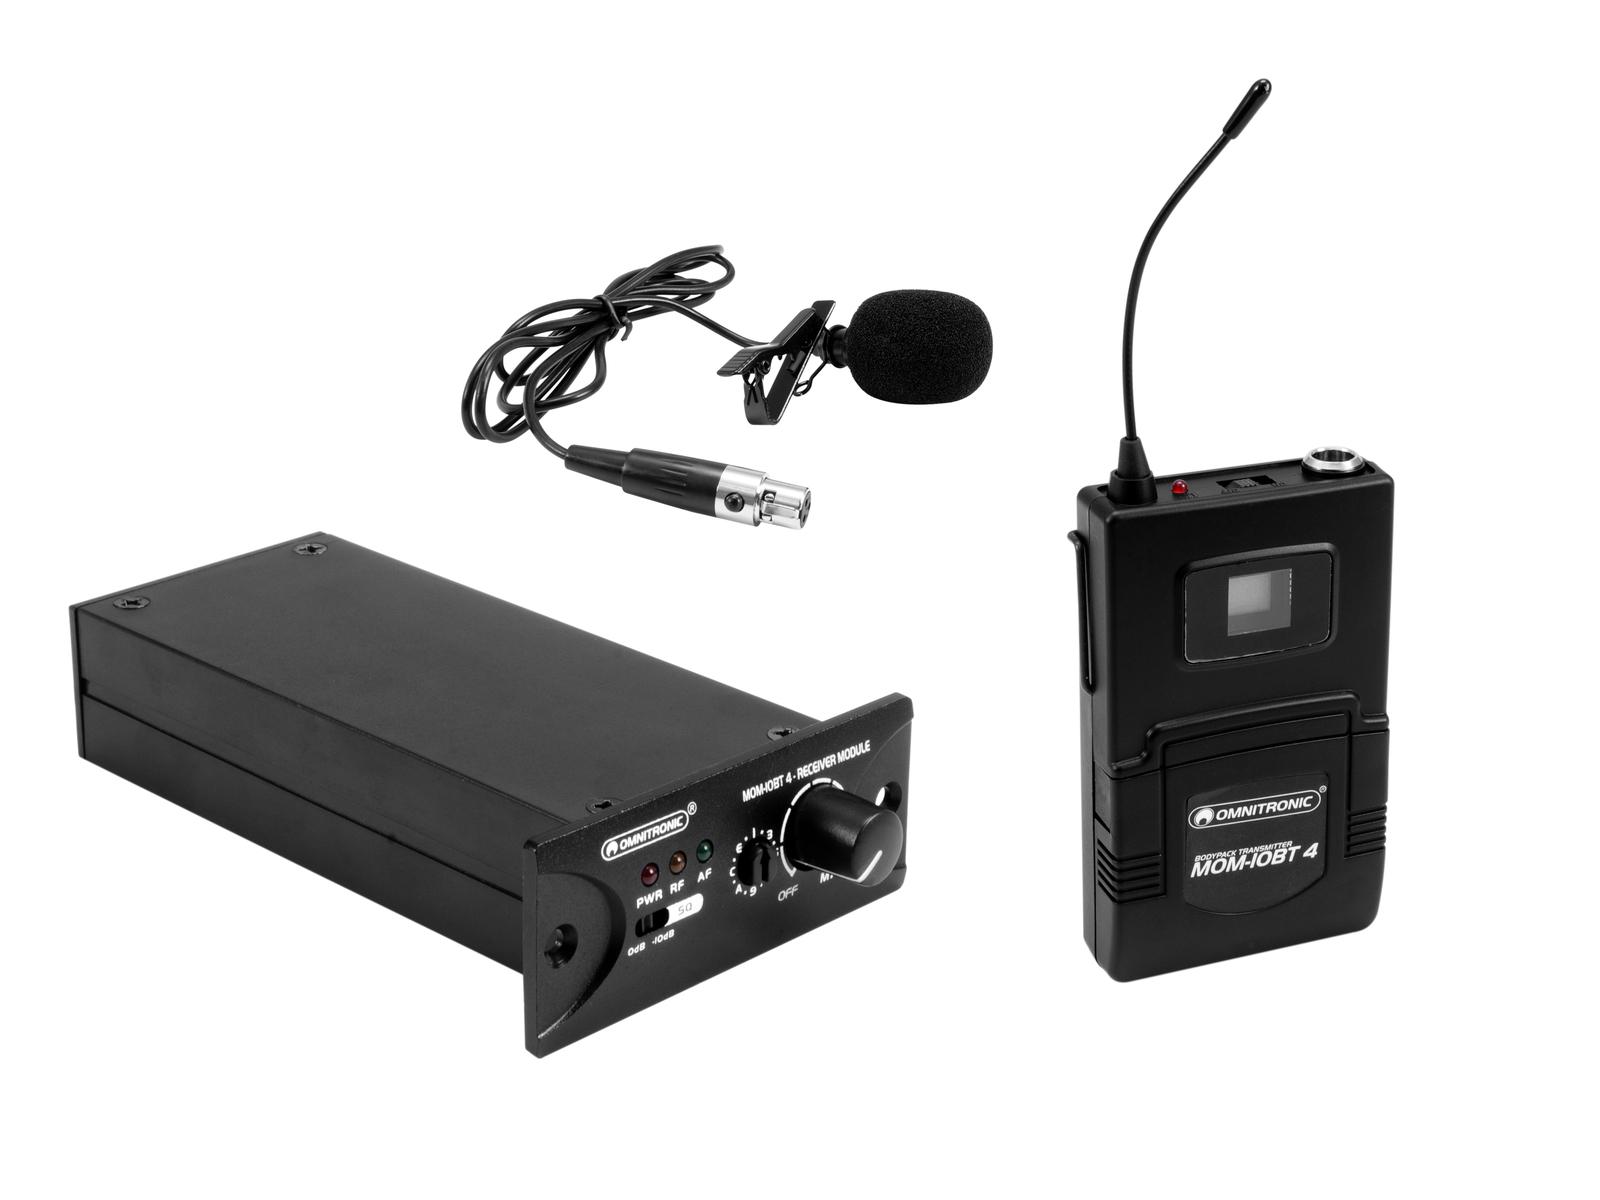 OMNITRONIC Set MOM-10BT4 Empfangsmodul + Taschensender + Lavalier-Mikrofon